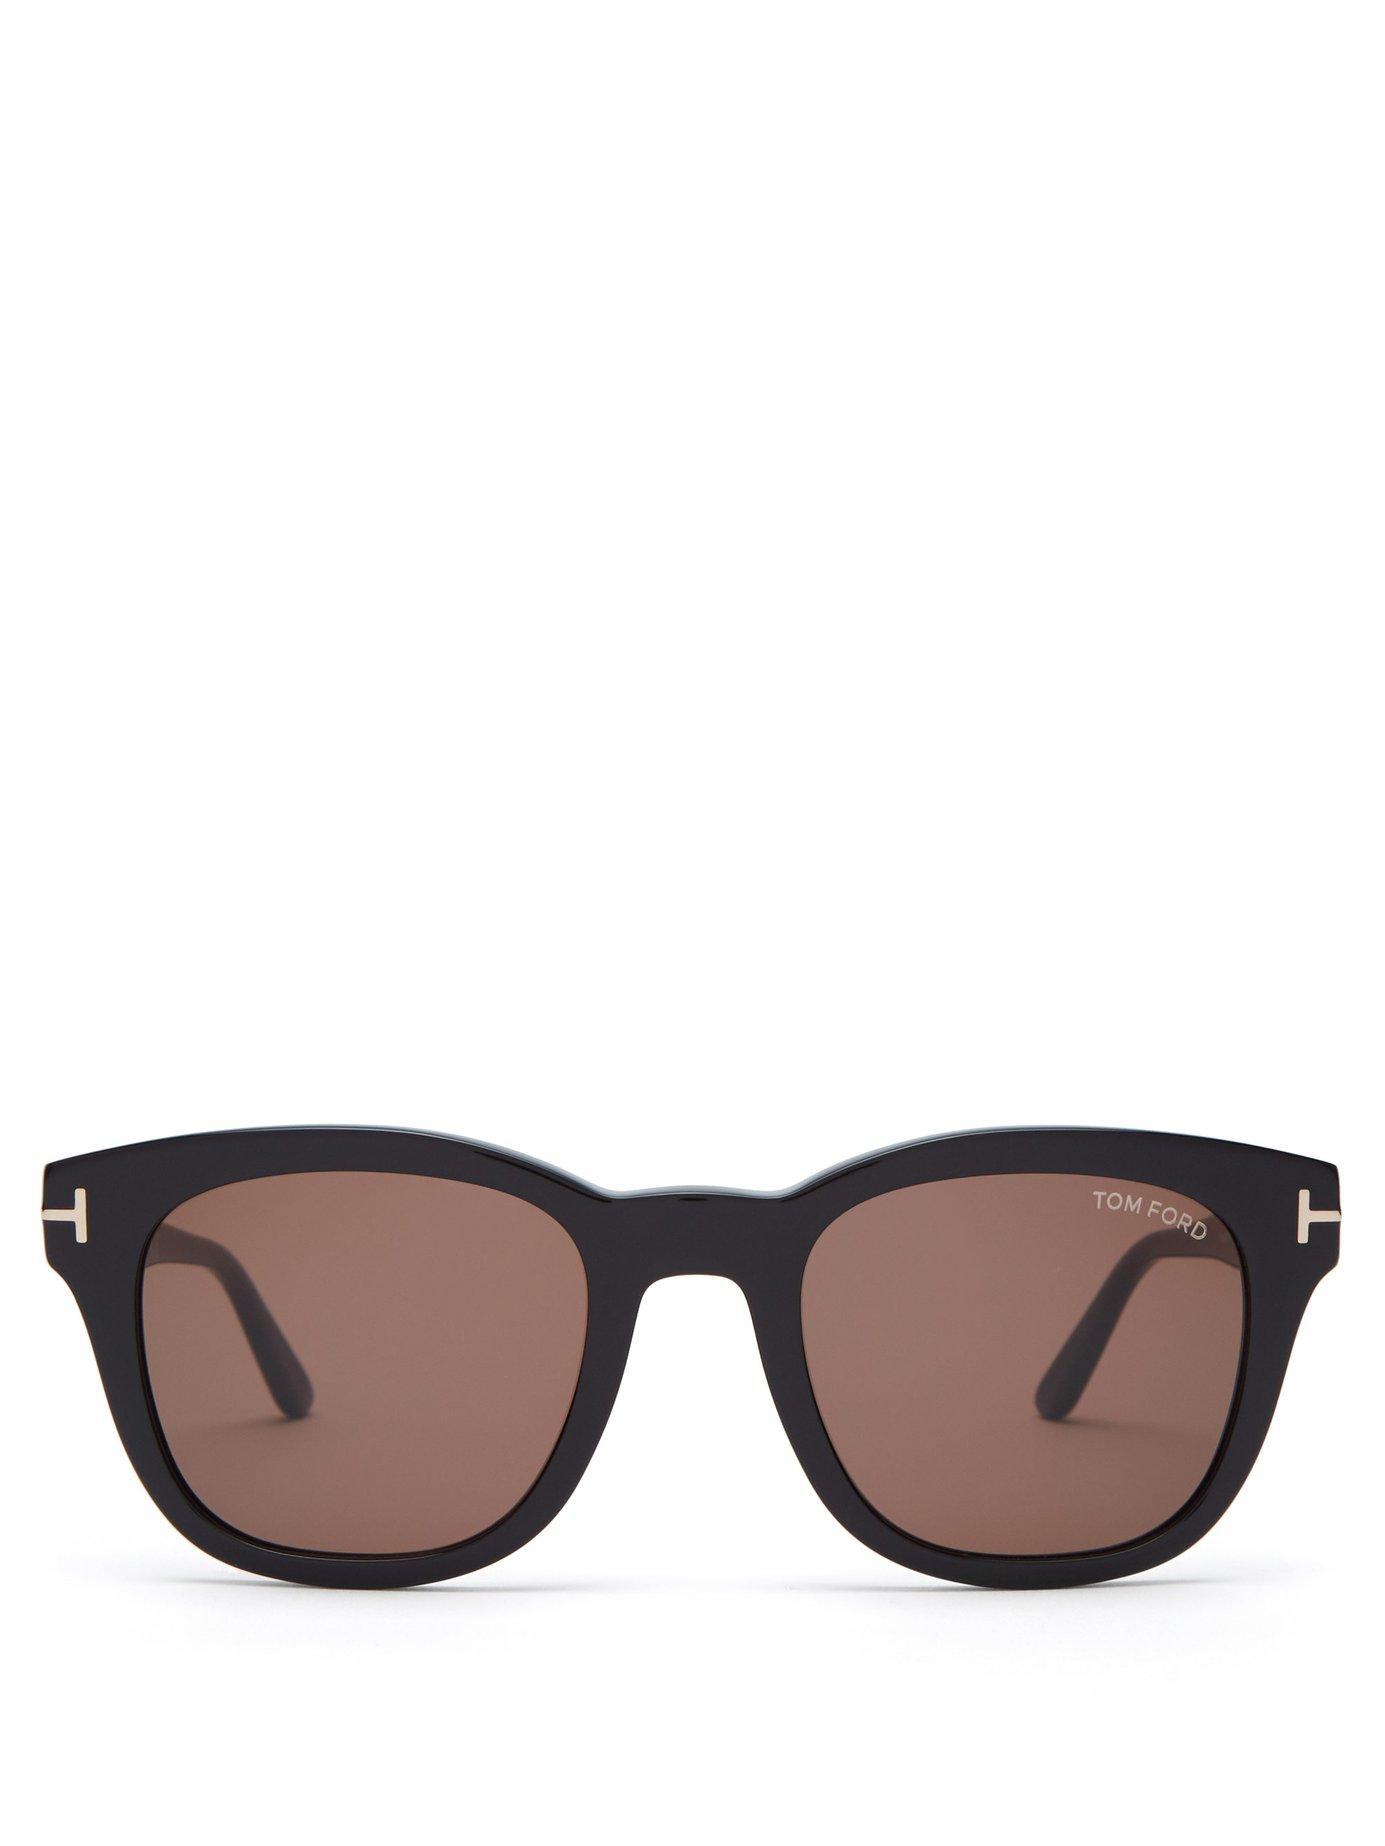 6be7014db8d Tom Ford - Black Eugenio Round Frame Acetate Sunglasses for Men - Lyst.  View fullscreen